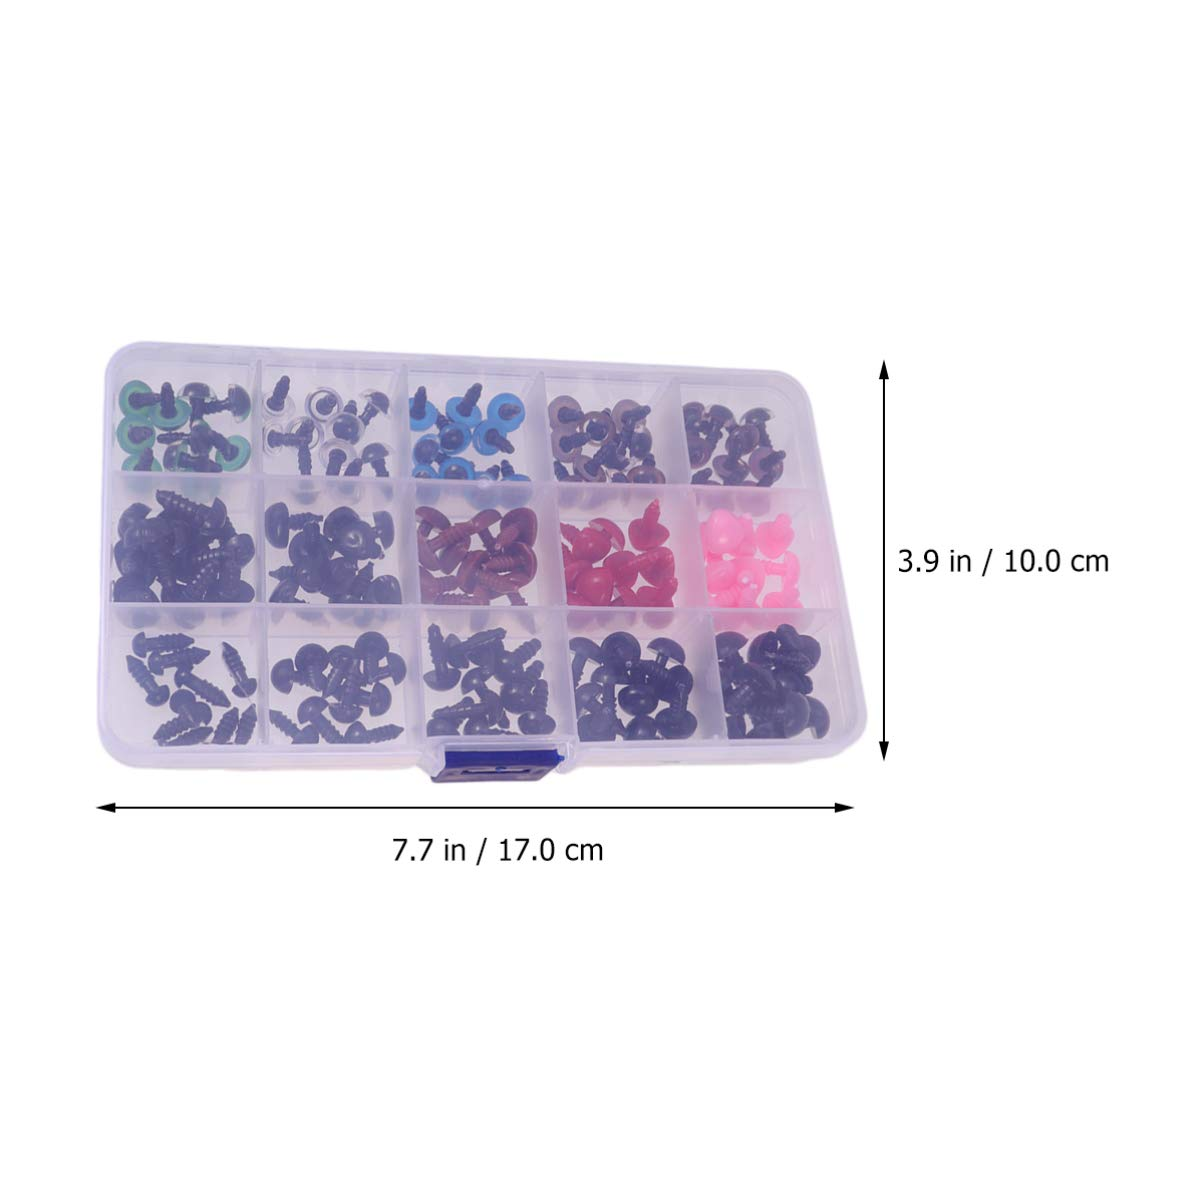 Healifty Nasi di Plastica per Occhi di Sicurezza da 150 Pezzi Fissati con Rondelle per Pupazzi di Peluche per Pupazzi di Bambole di Orsi